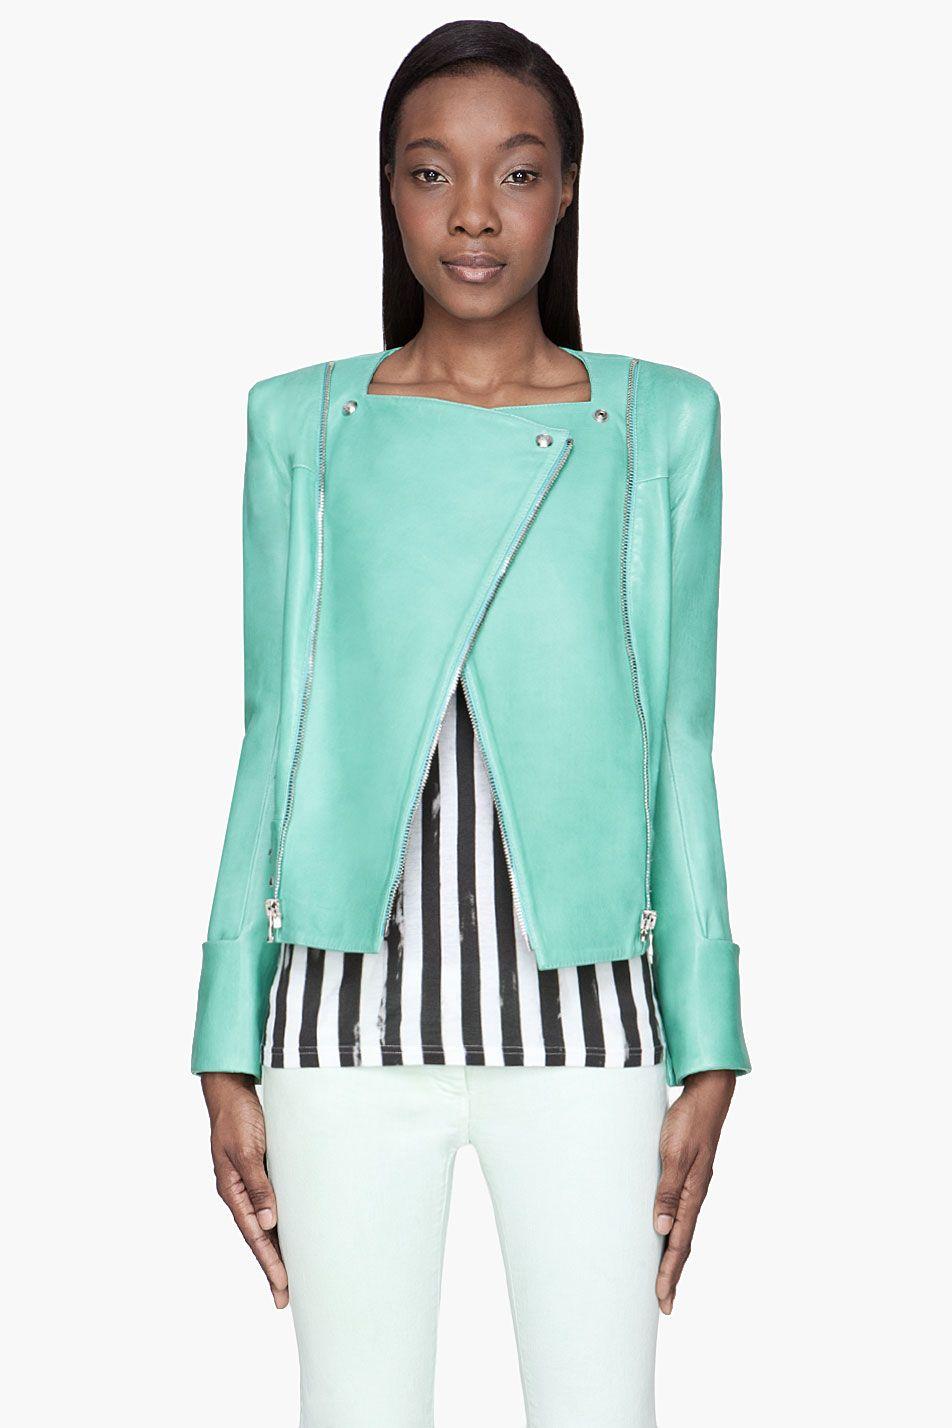 903b3857 Women's Mint Green Leather Zipped Biker Jacket in 2019 | Clothes ...